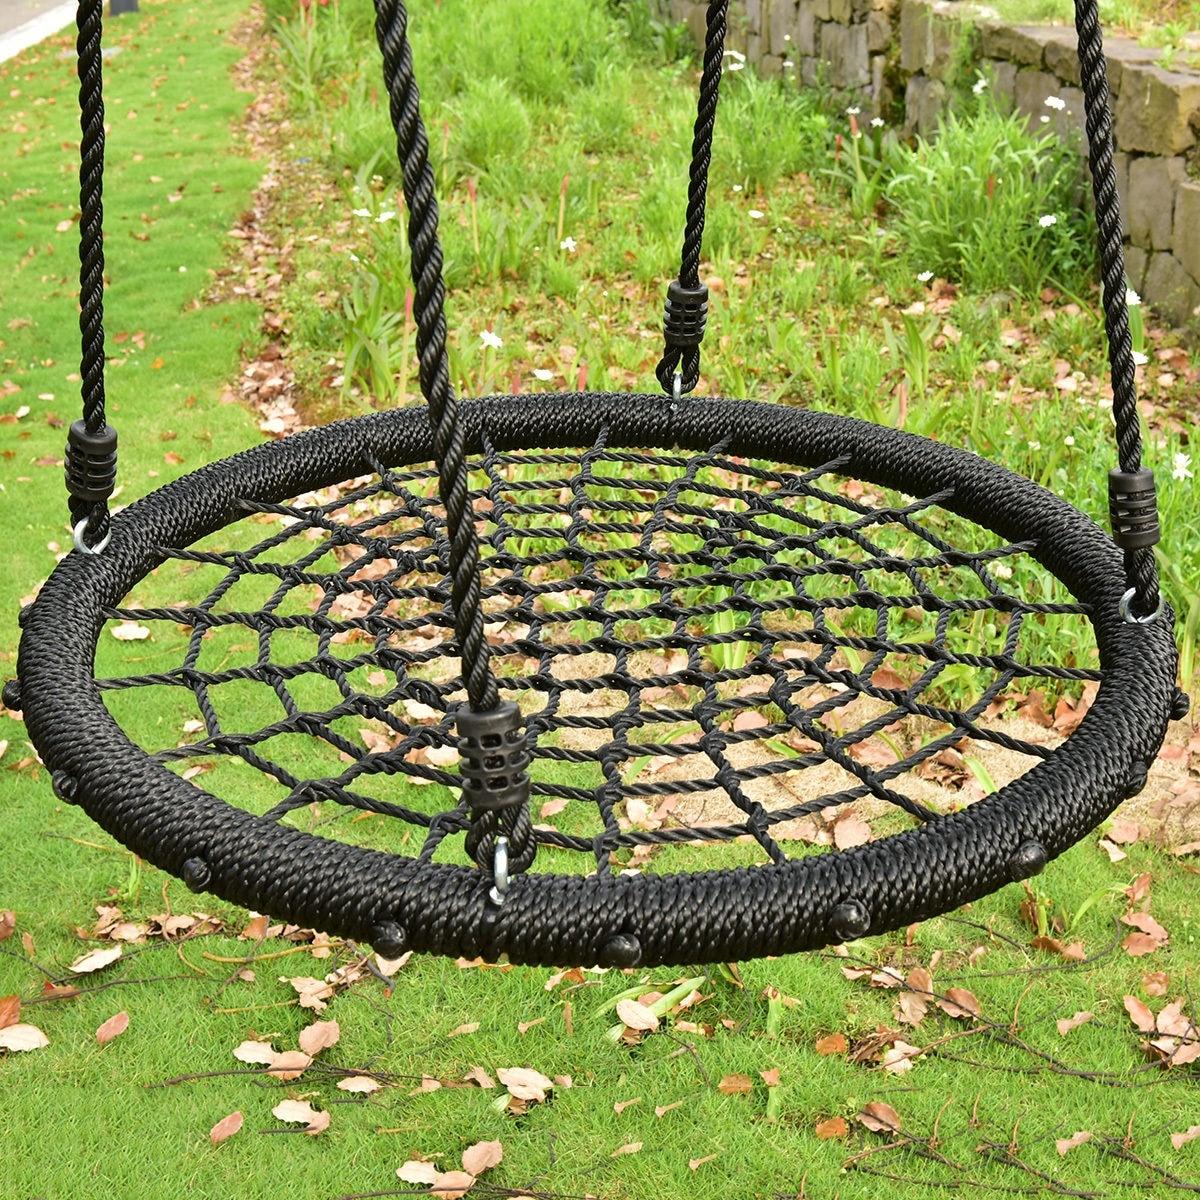 Costway 31 5 Kid Tree Round Swing Net Outdoor Garden Children Toddler Hanging Rope Nest Free Shipping Today 16637740